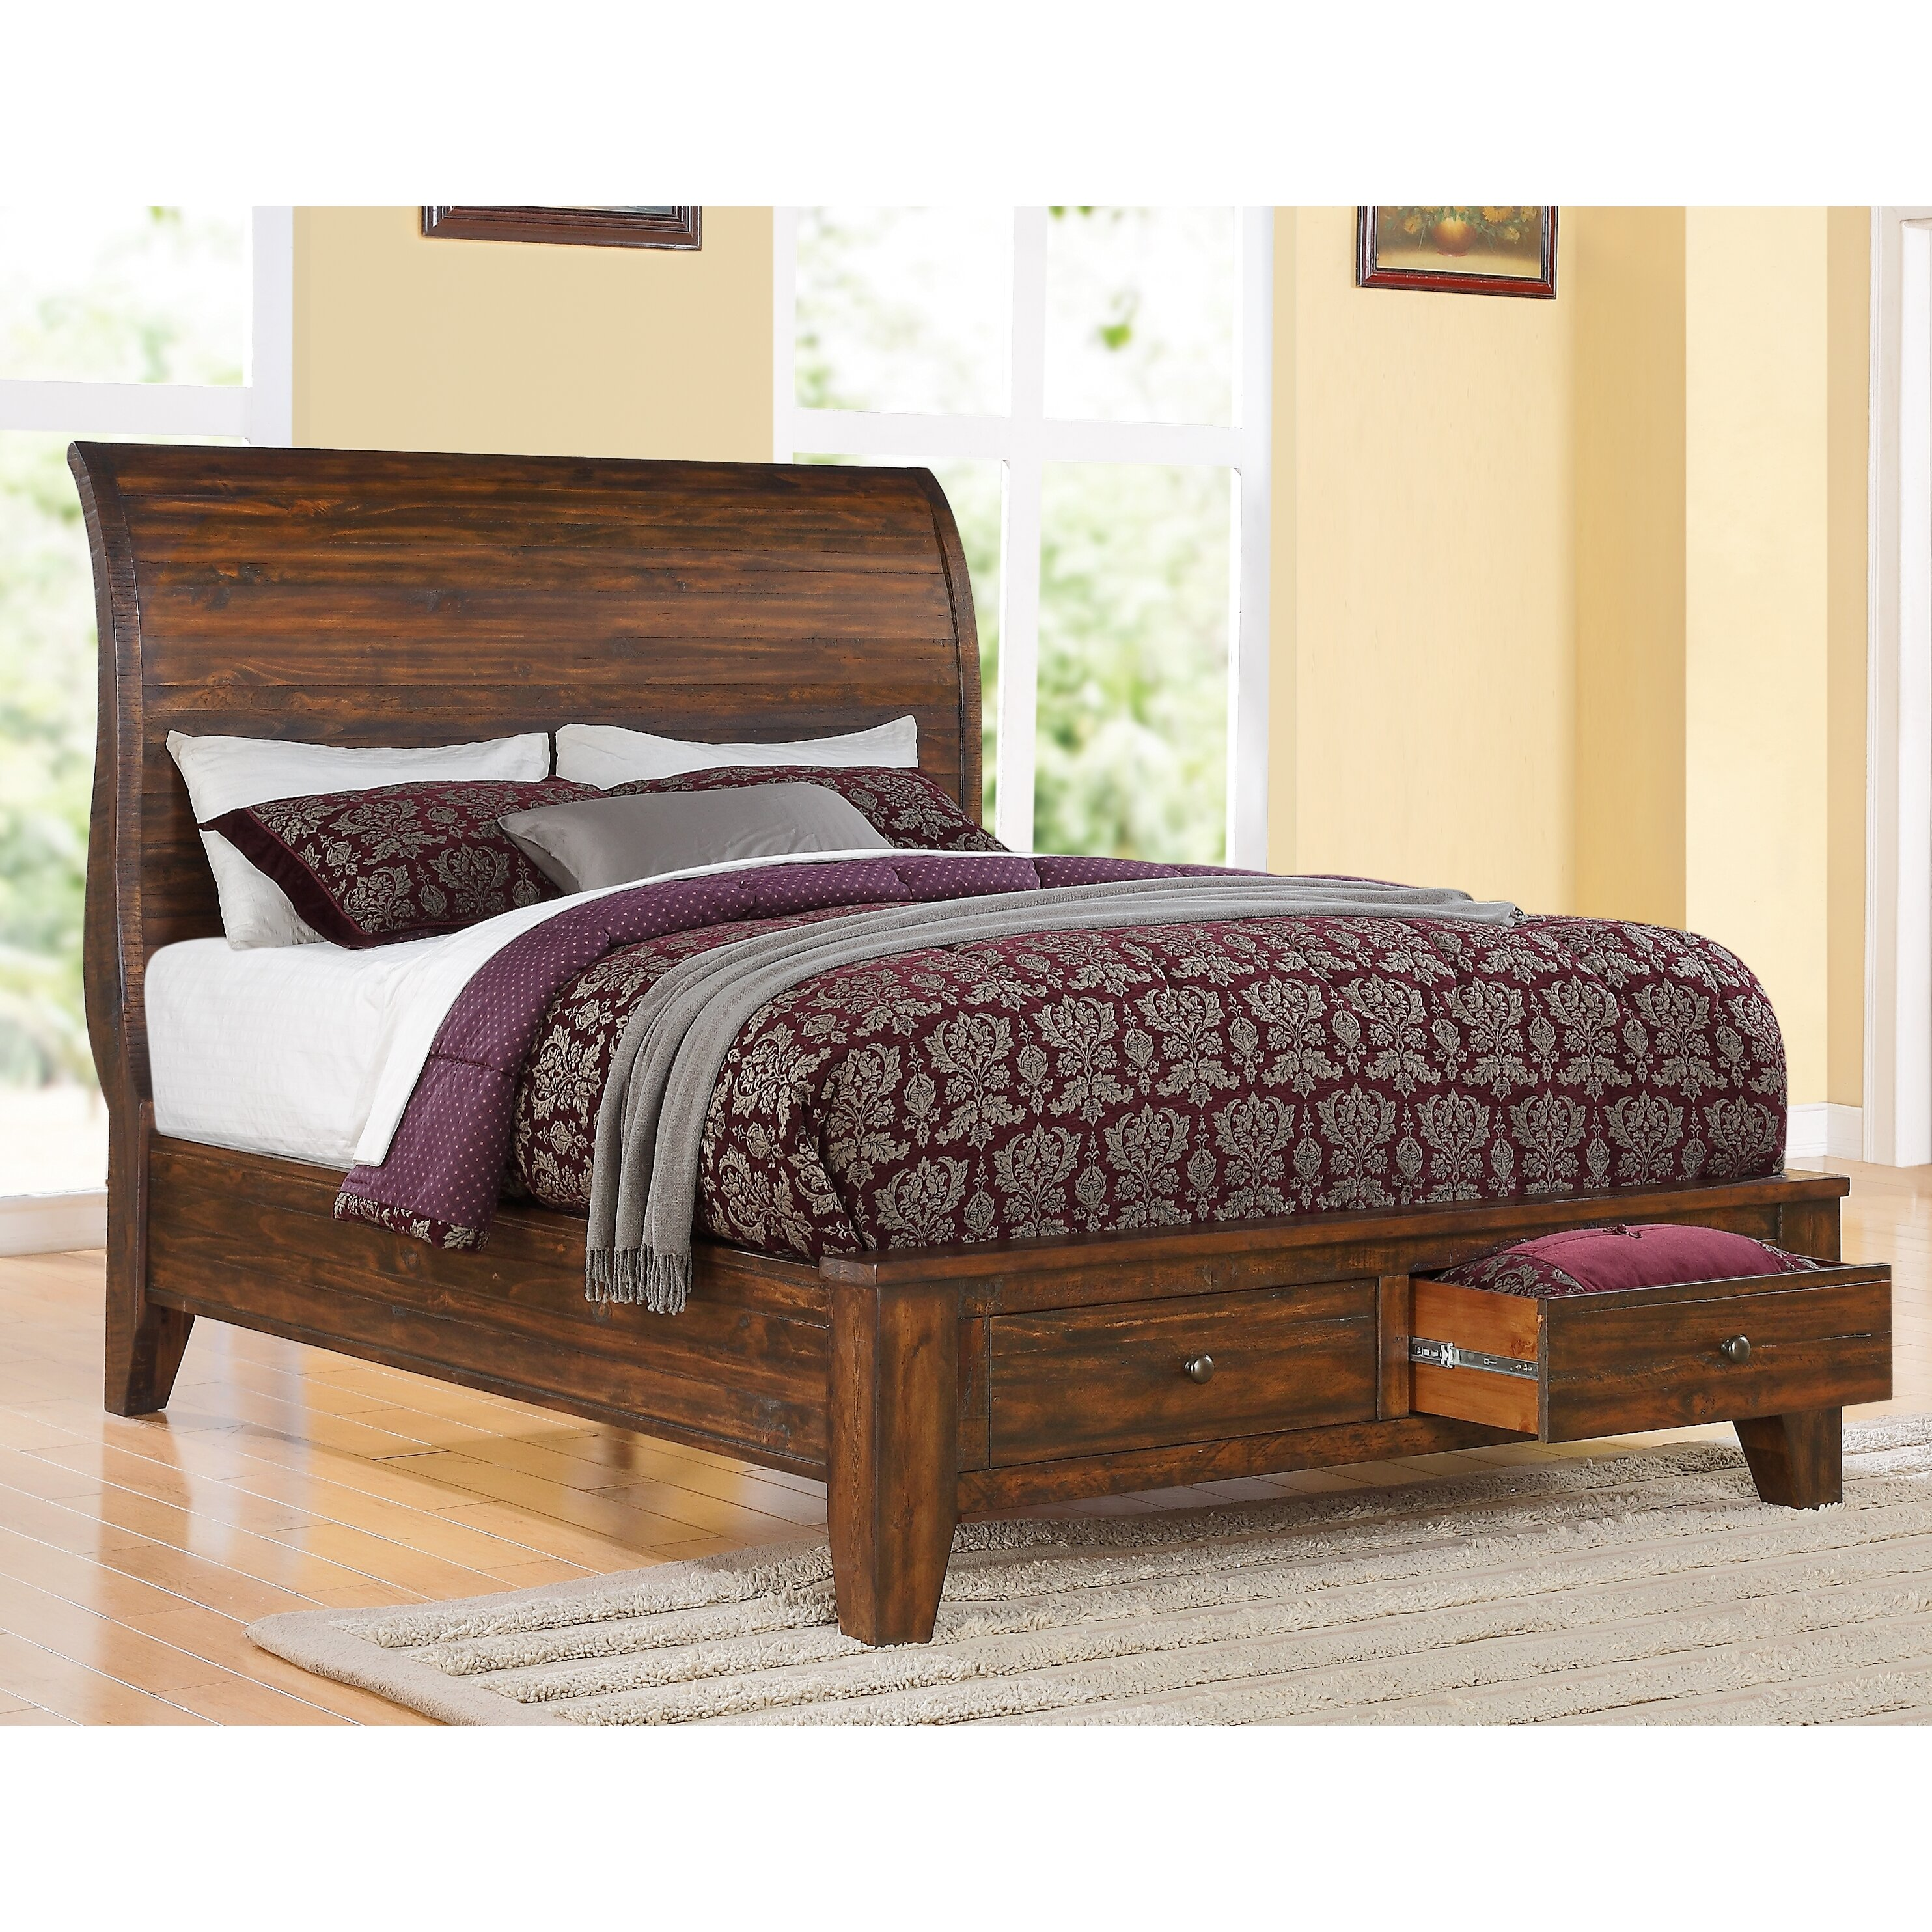 Modus cally storage platform bed reviews - Platform bedroom sets with storage ...